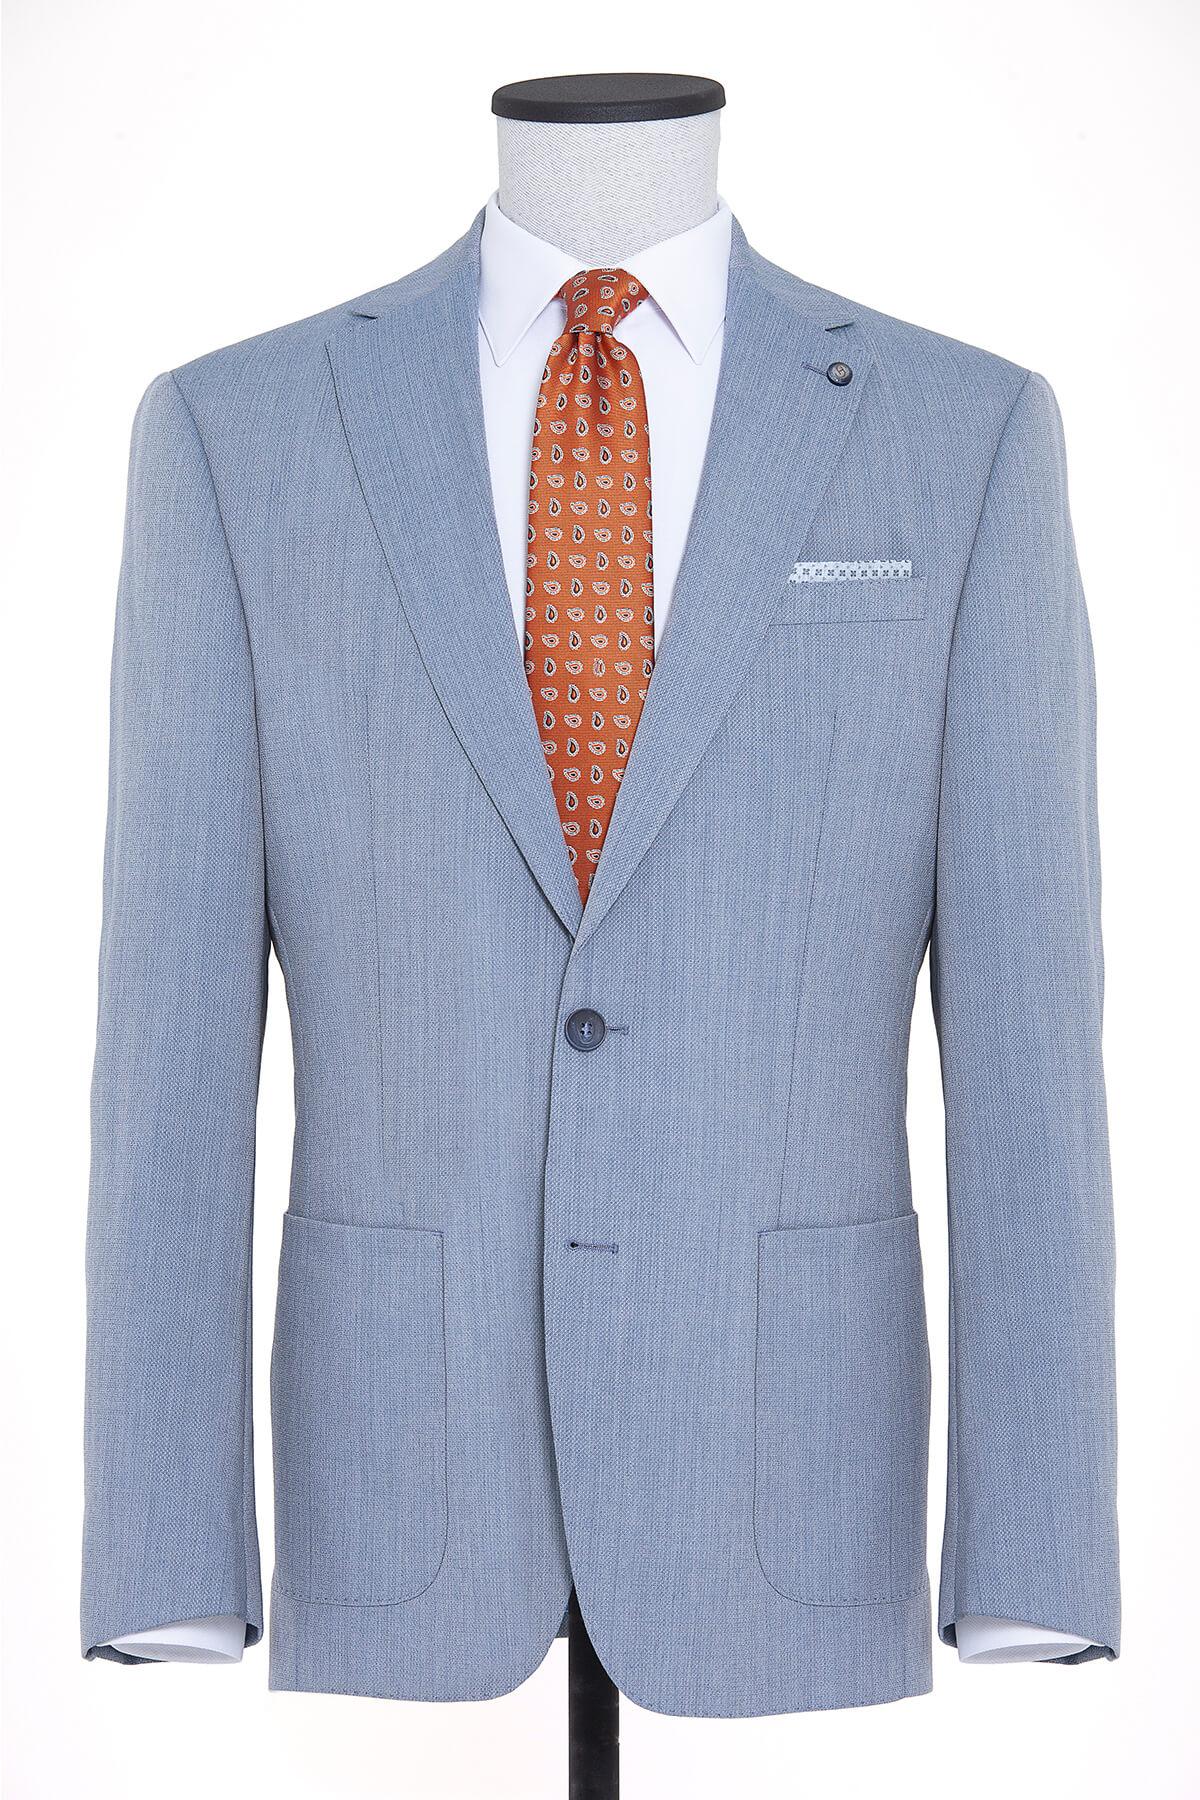 Mavi Desenli Slim Fit Ceket